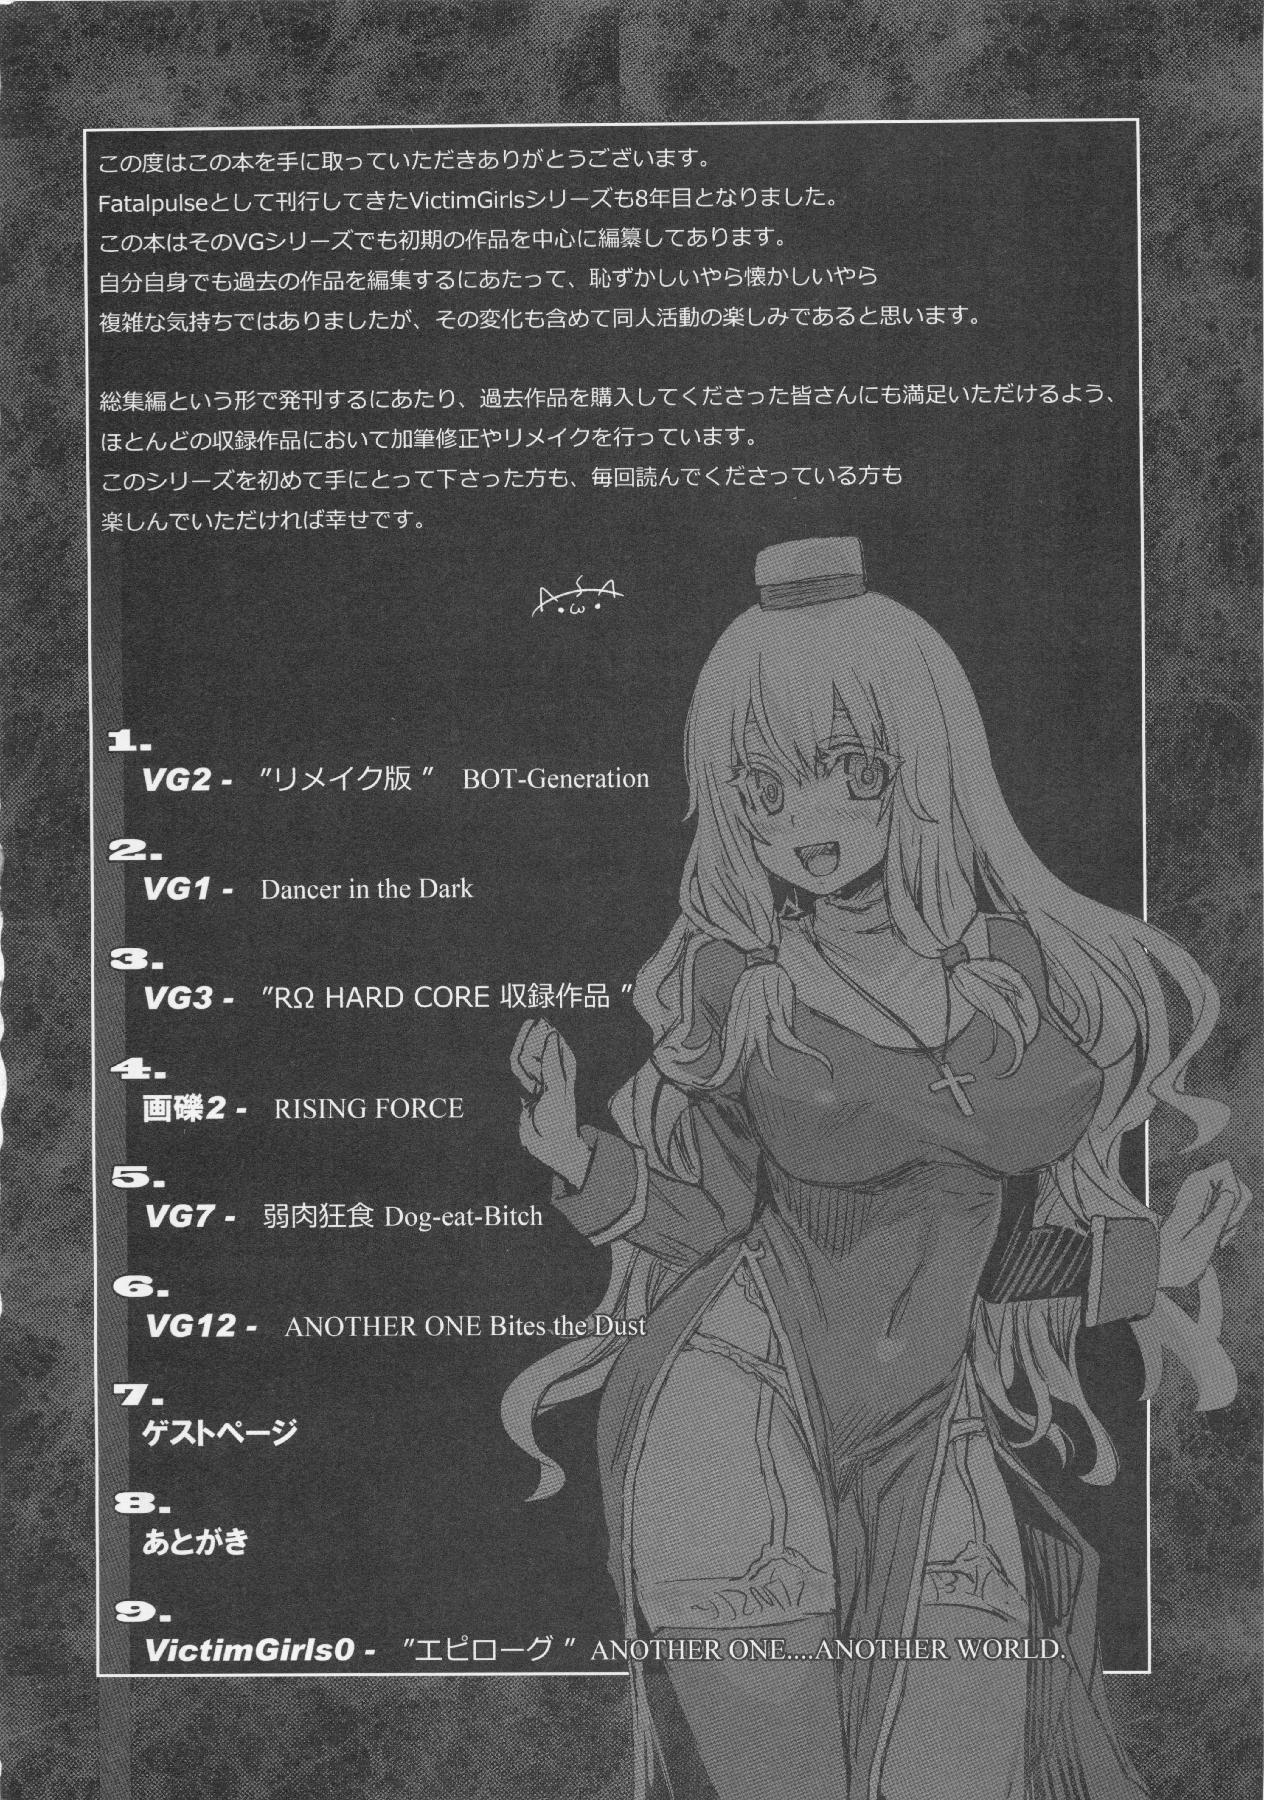 (C83) [Fatalpulse (Asanagi)] VictimGirls Compiled Vol.1 -Victimgirls Soushuuhen 1- MMO Game Selection (Various) 6